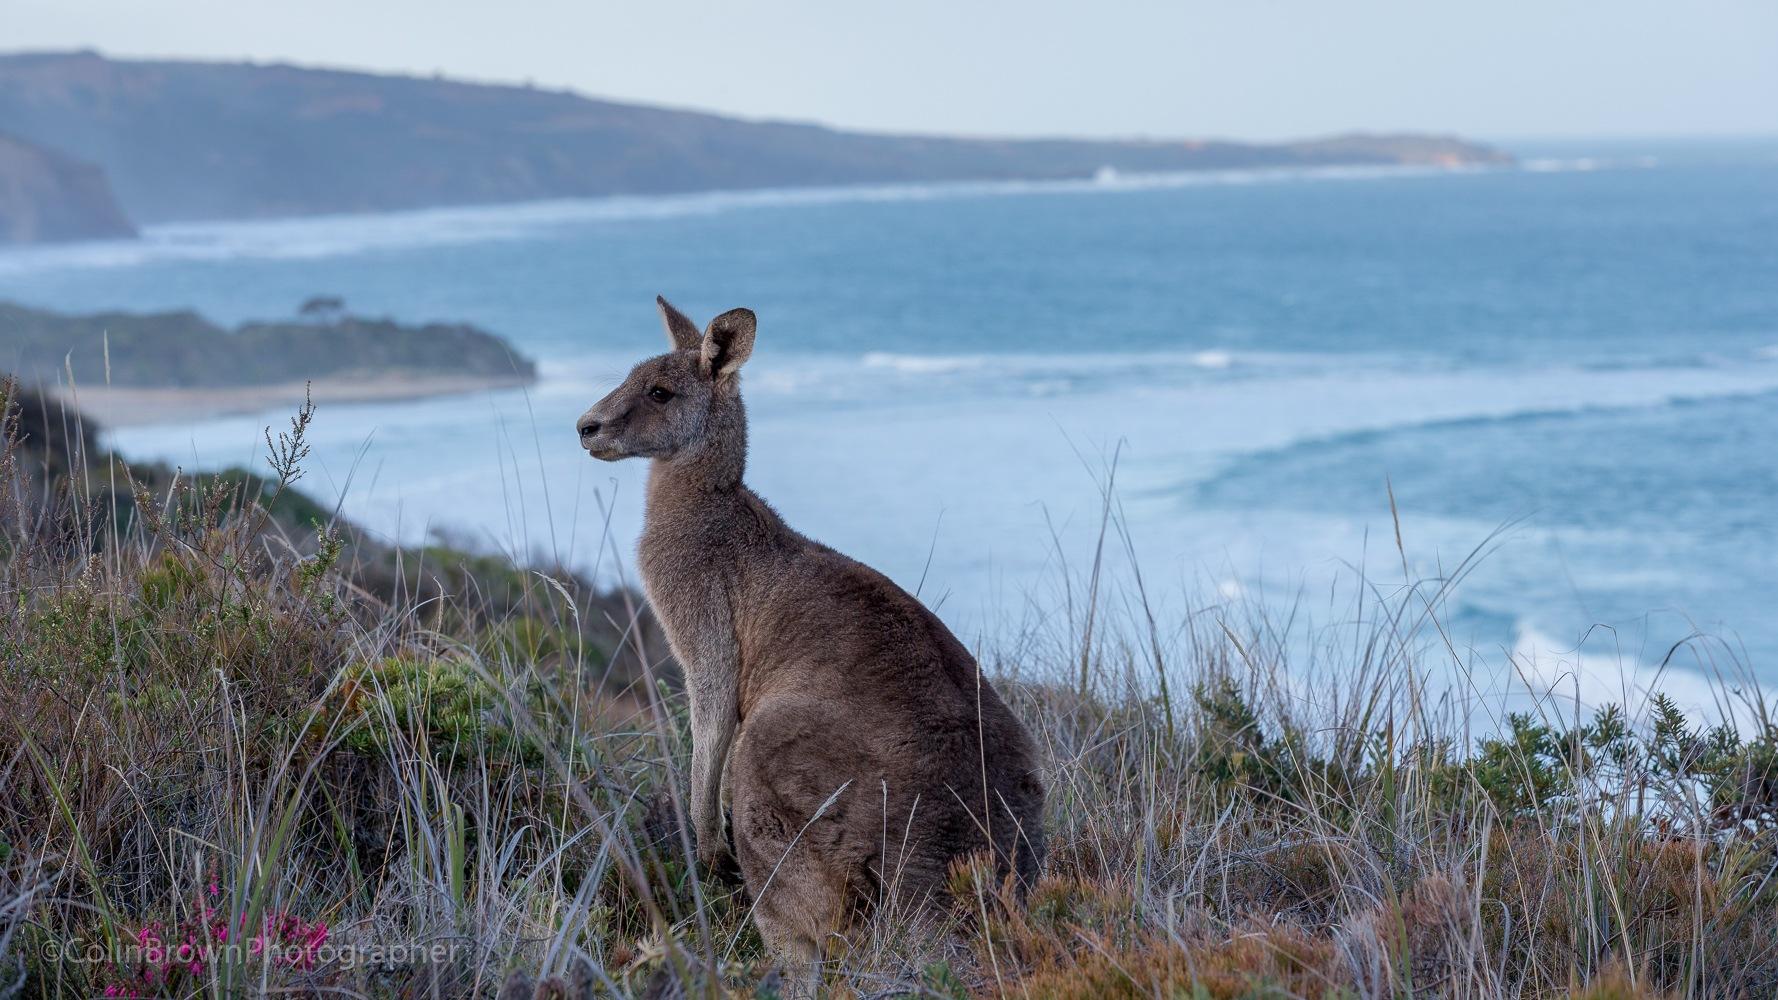 Kangaroo by ColinBrownPhotographer